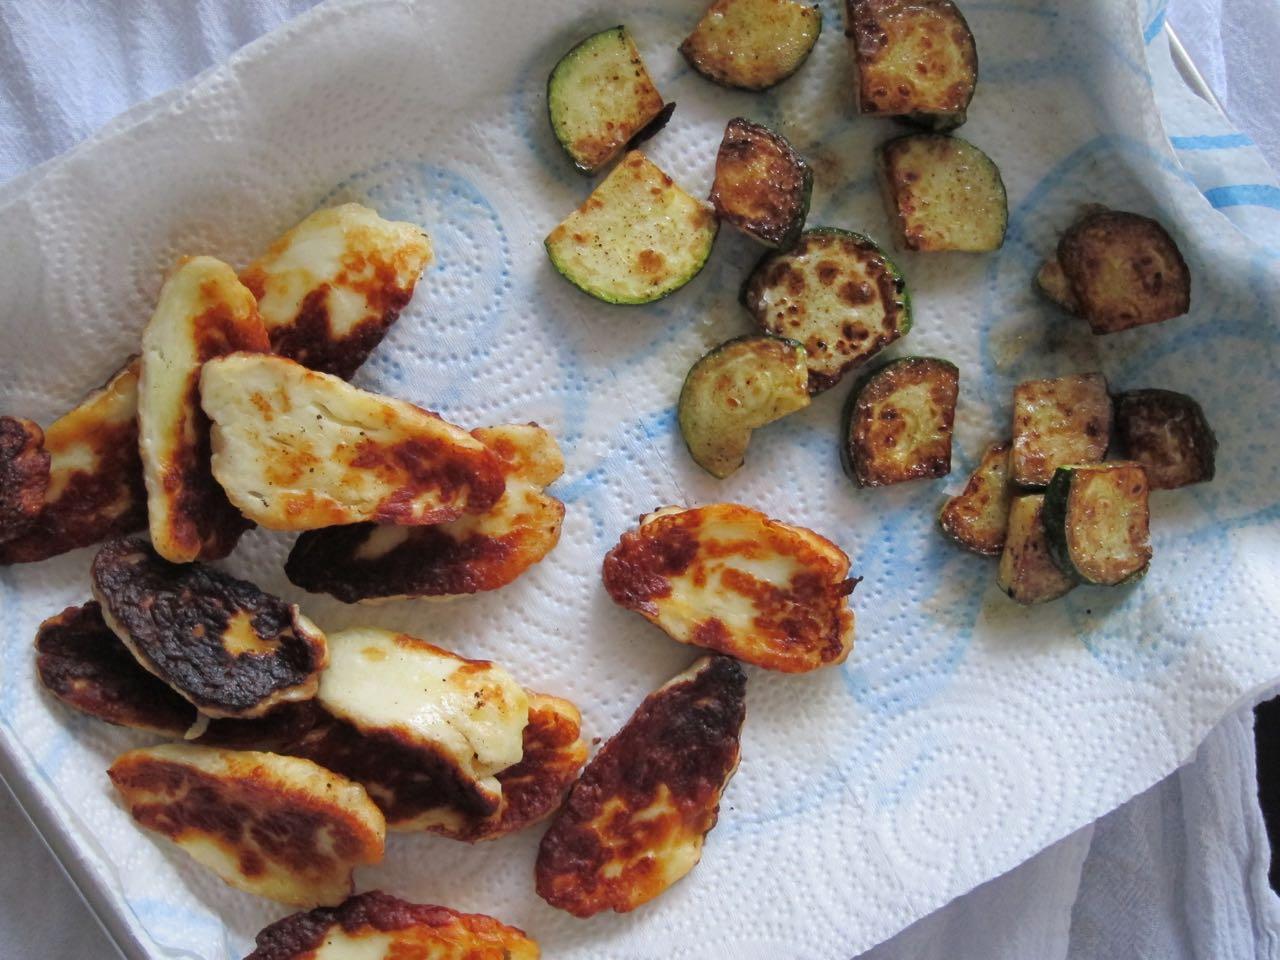 Fried Haloumi and Zaatar